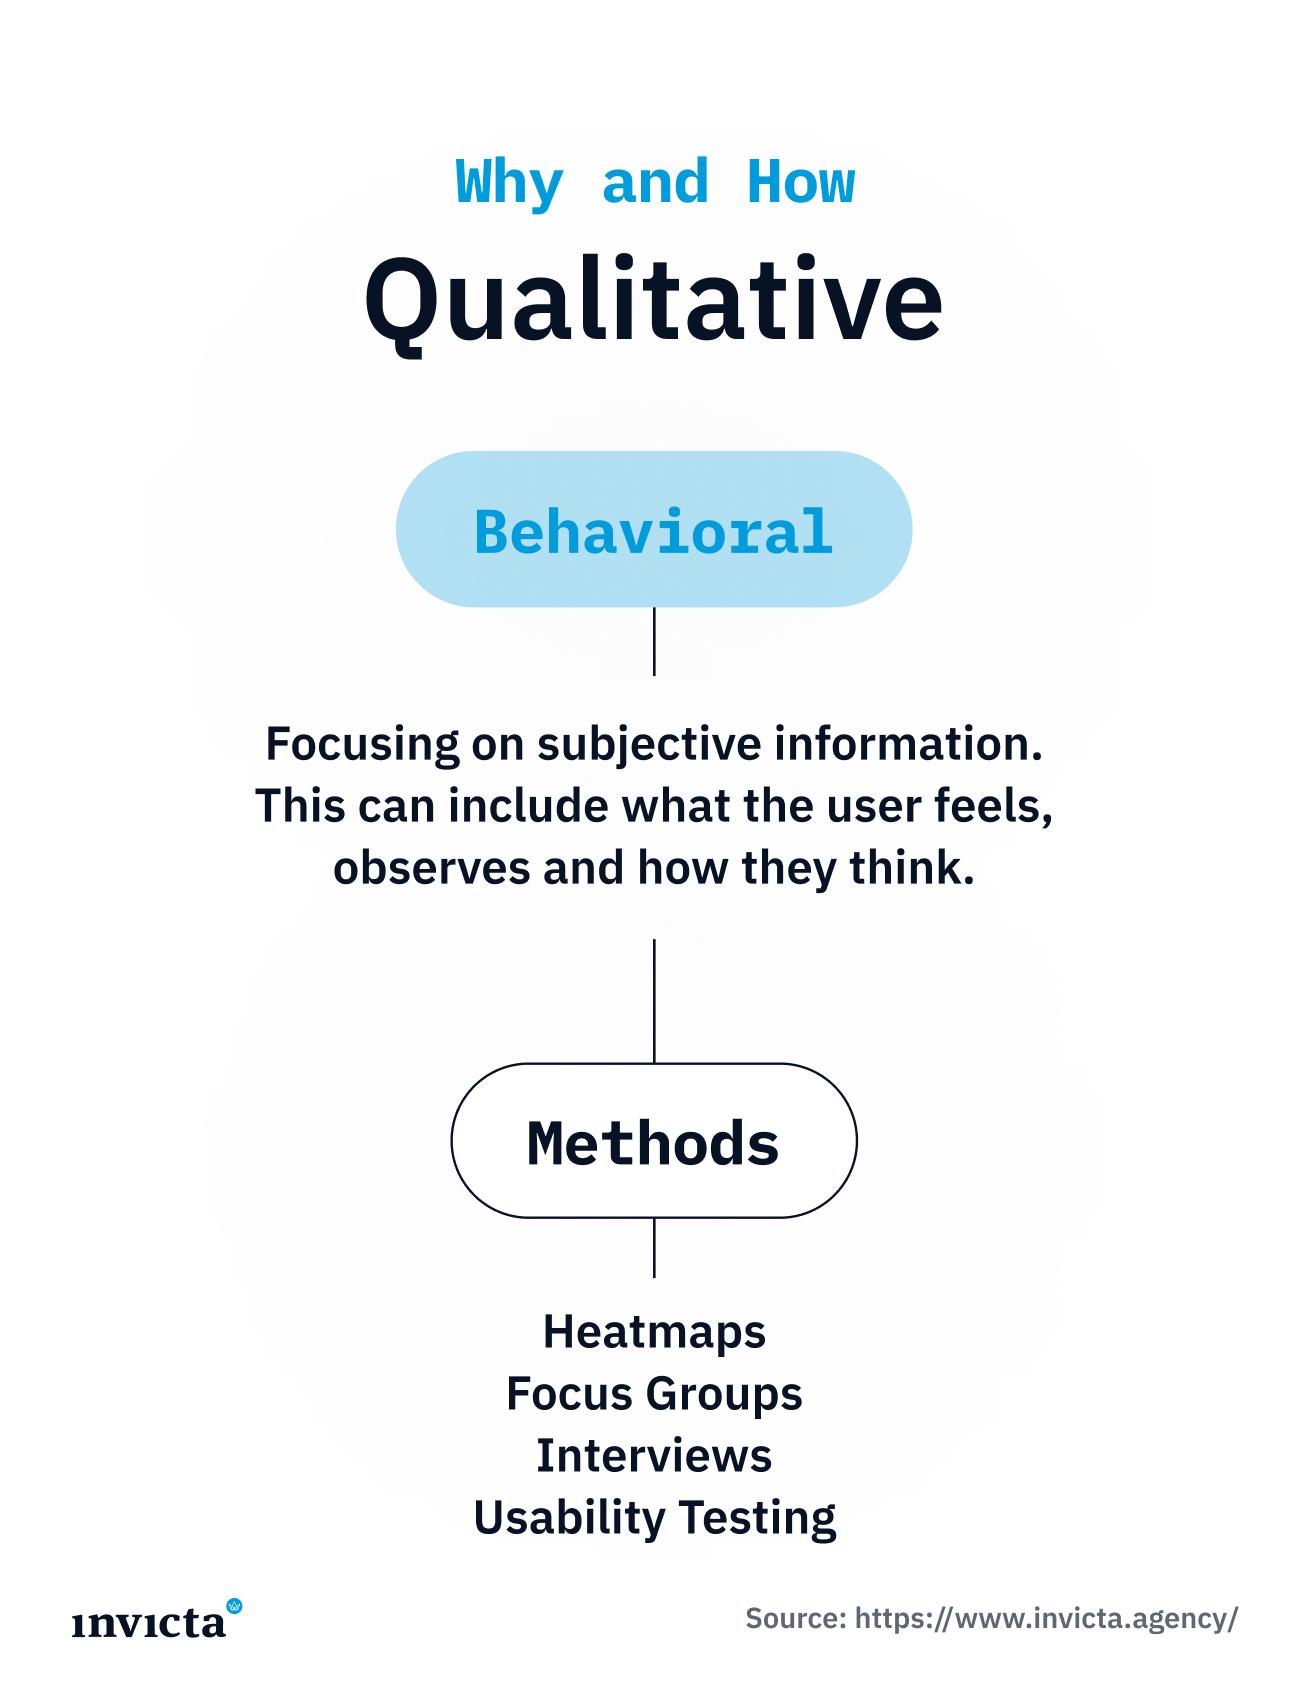 UX- Qualitative User Research Methods